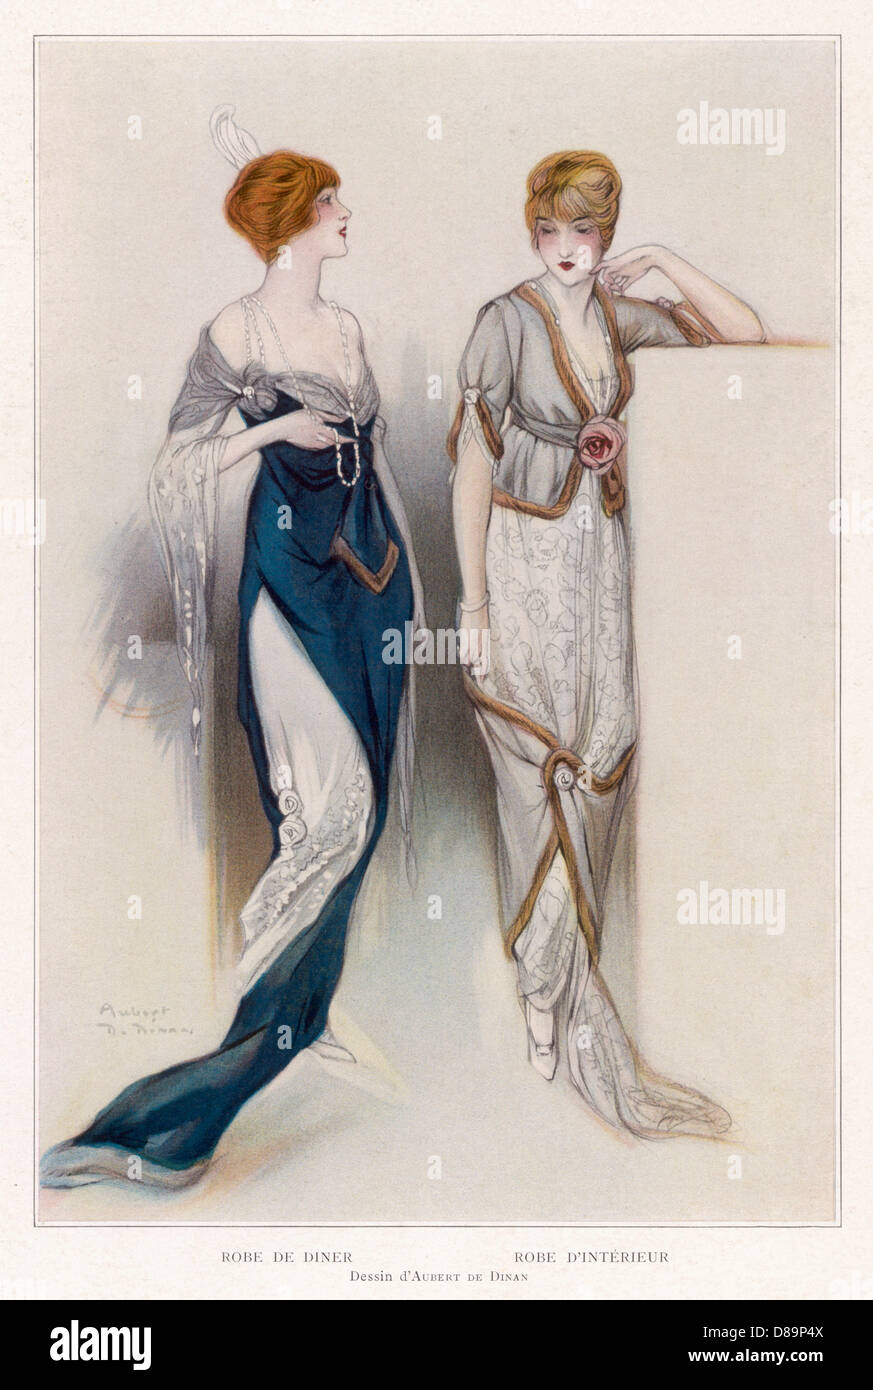 Les Modes 1913 Photo Stock